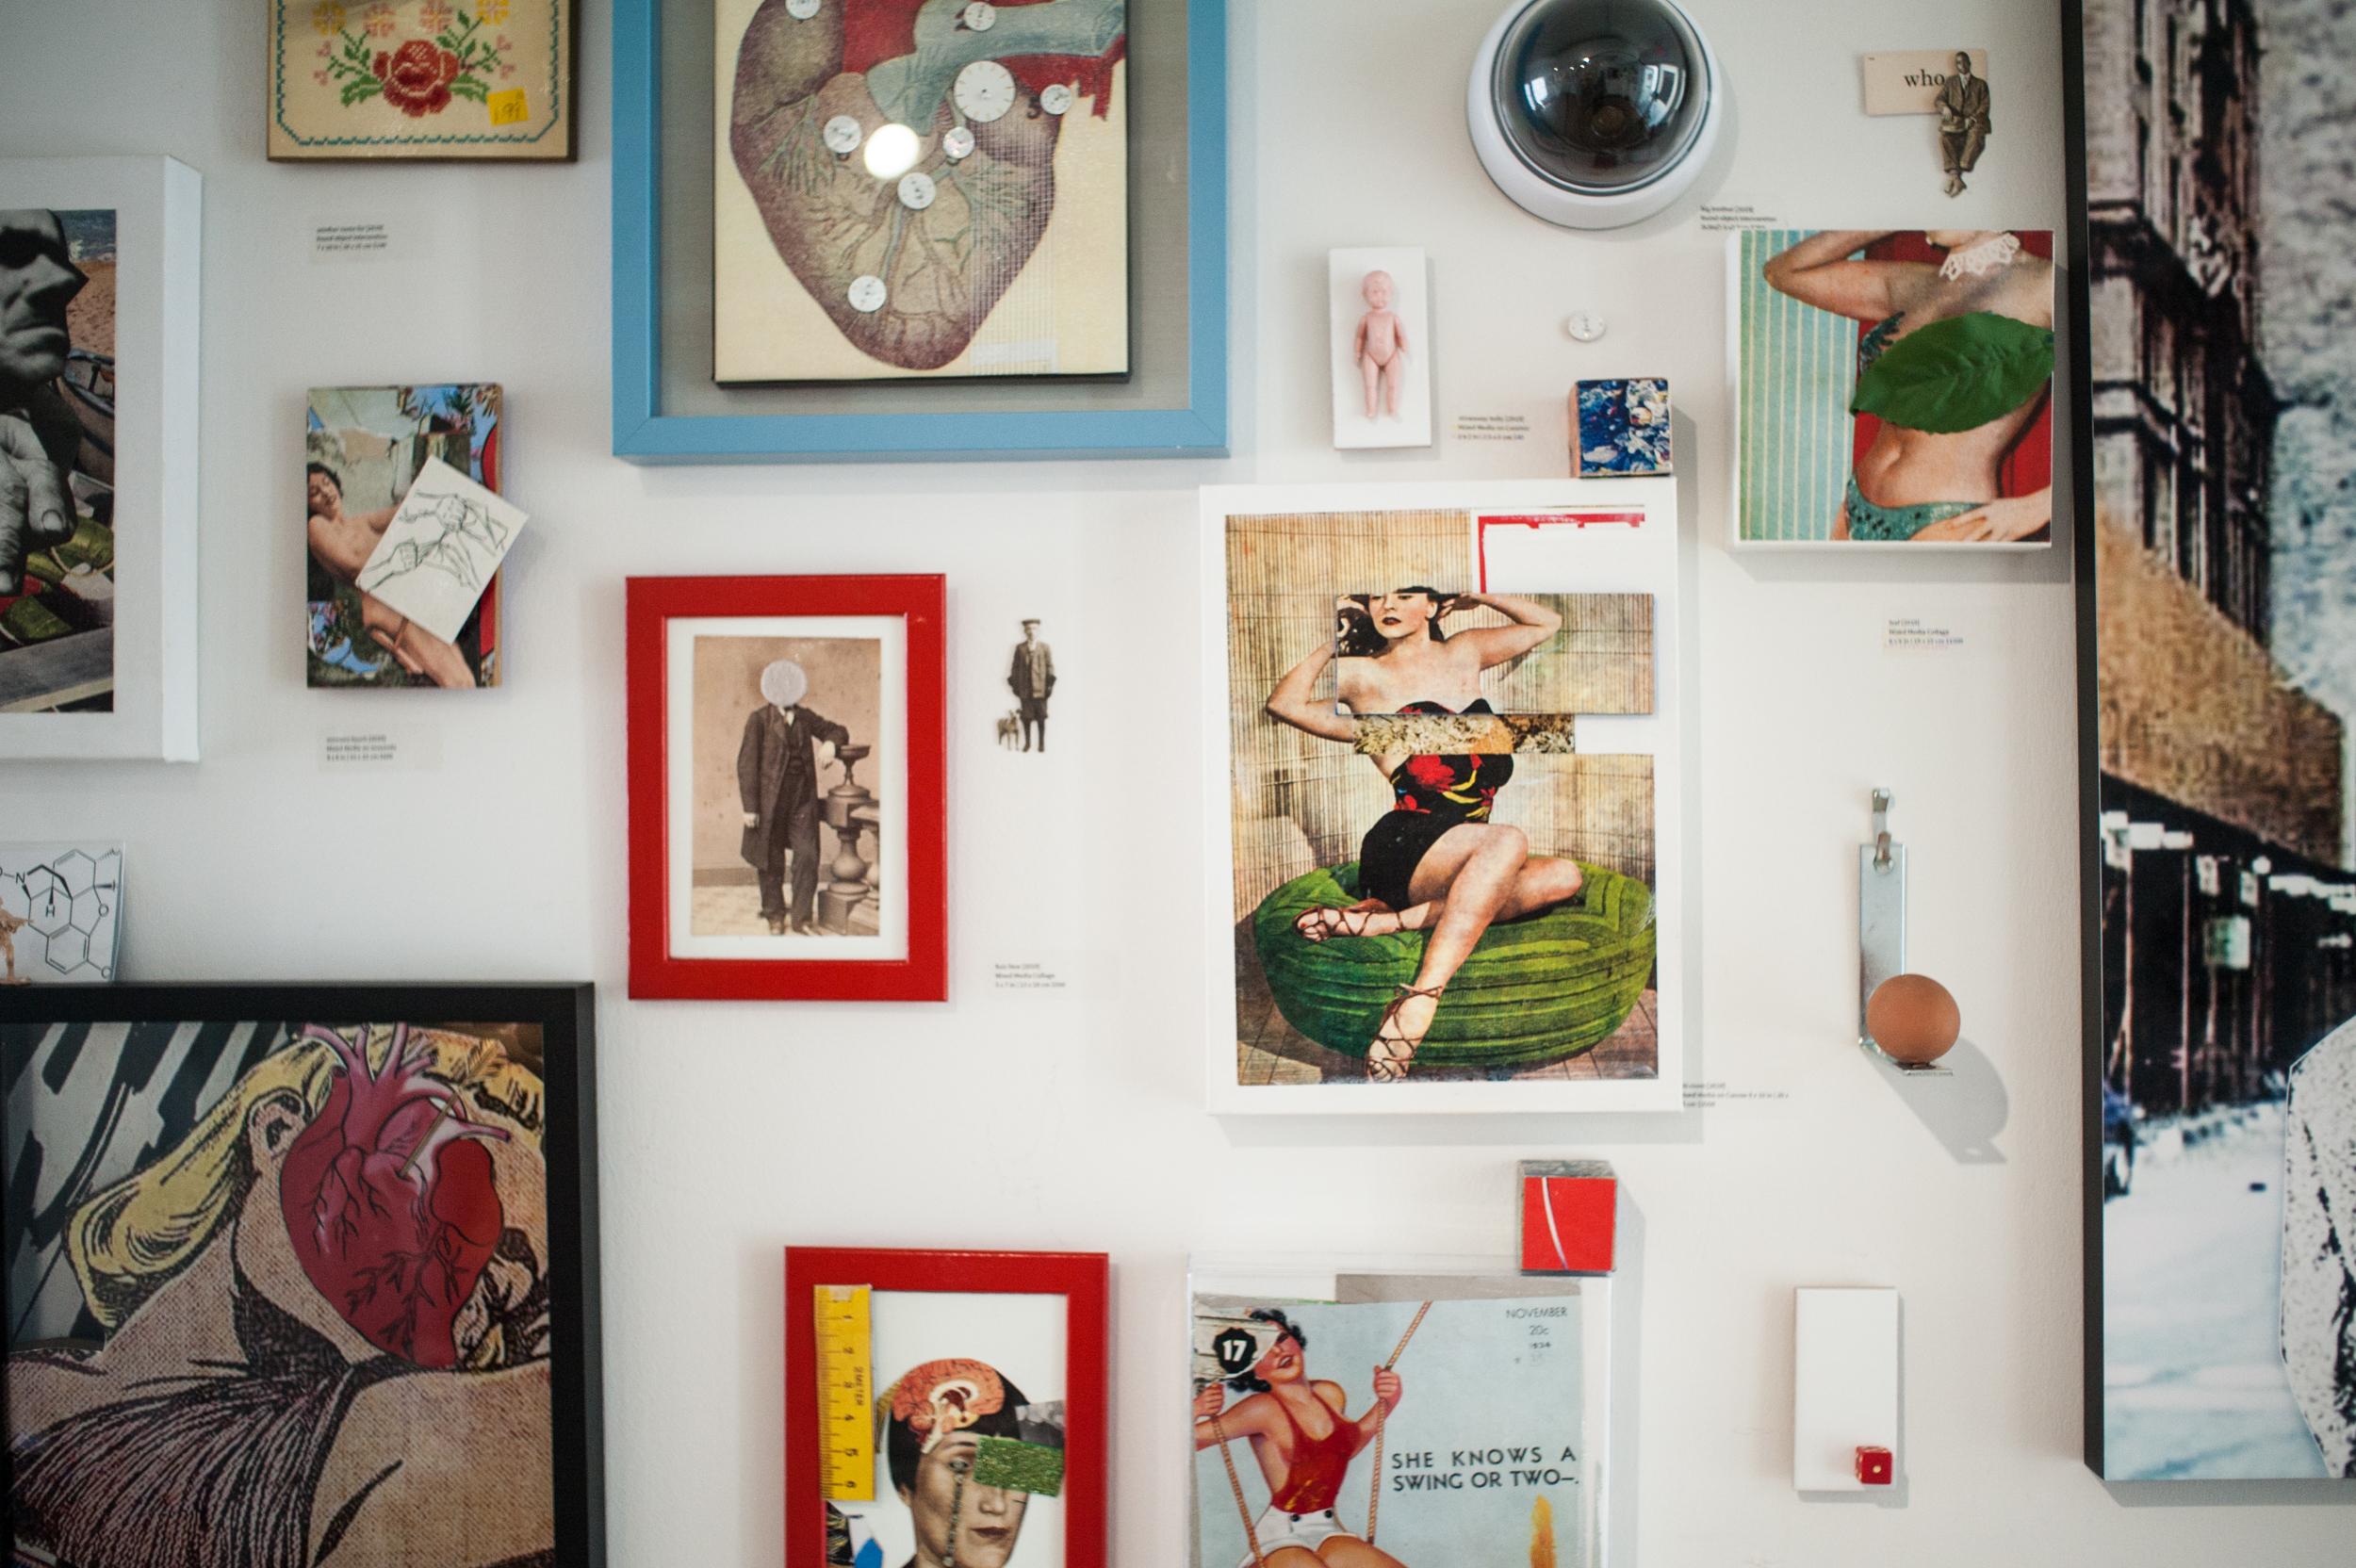 Faena-Exhibition-Images-68.jpg